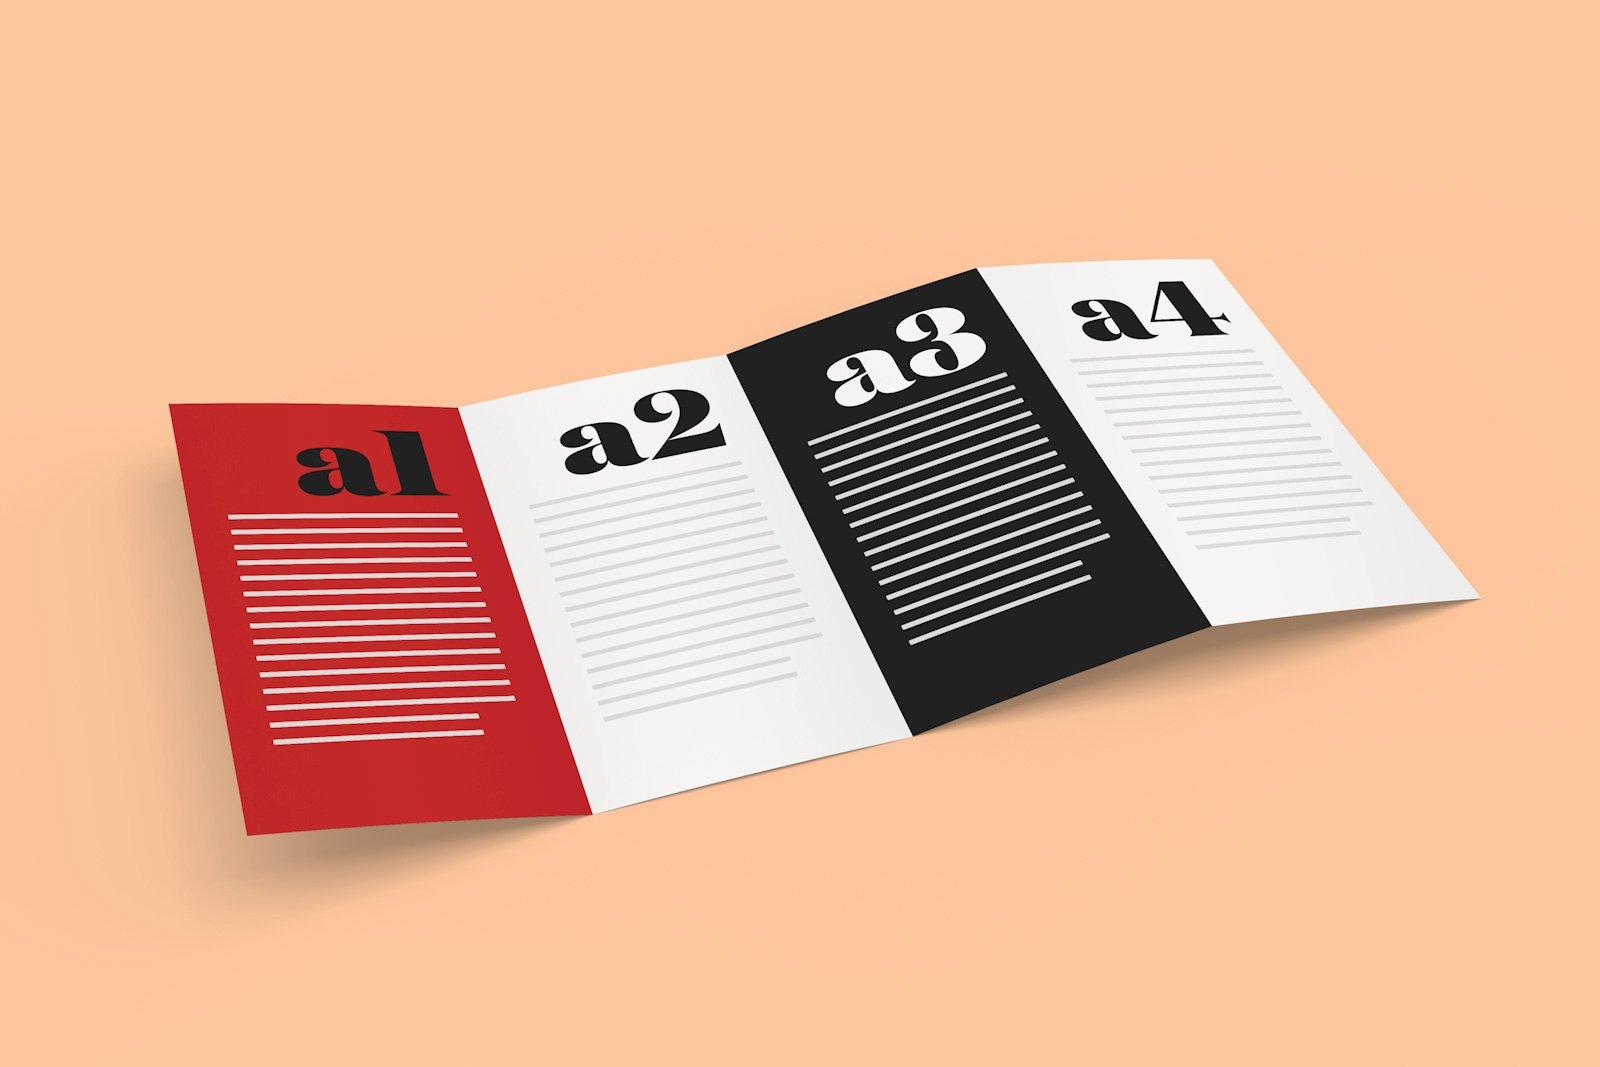 Quad Fold Brochure Template Luxury Free 4 Panel Quad Fold Brochure Mockup Psd Good Mockups